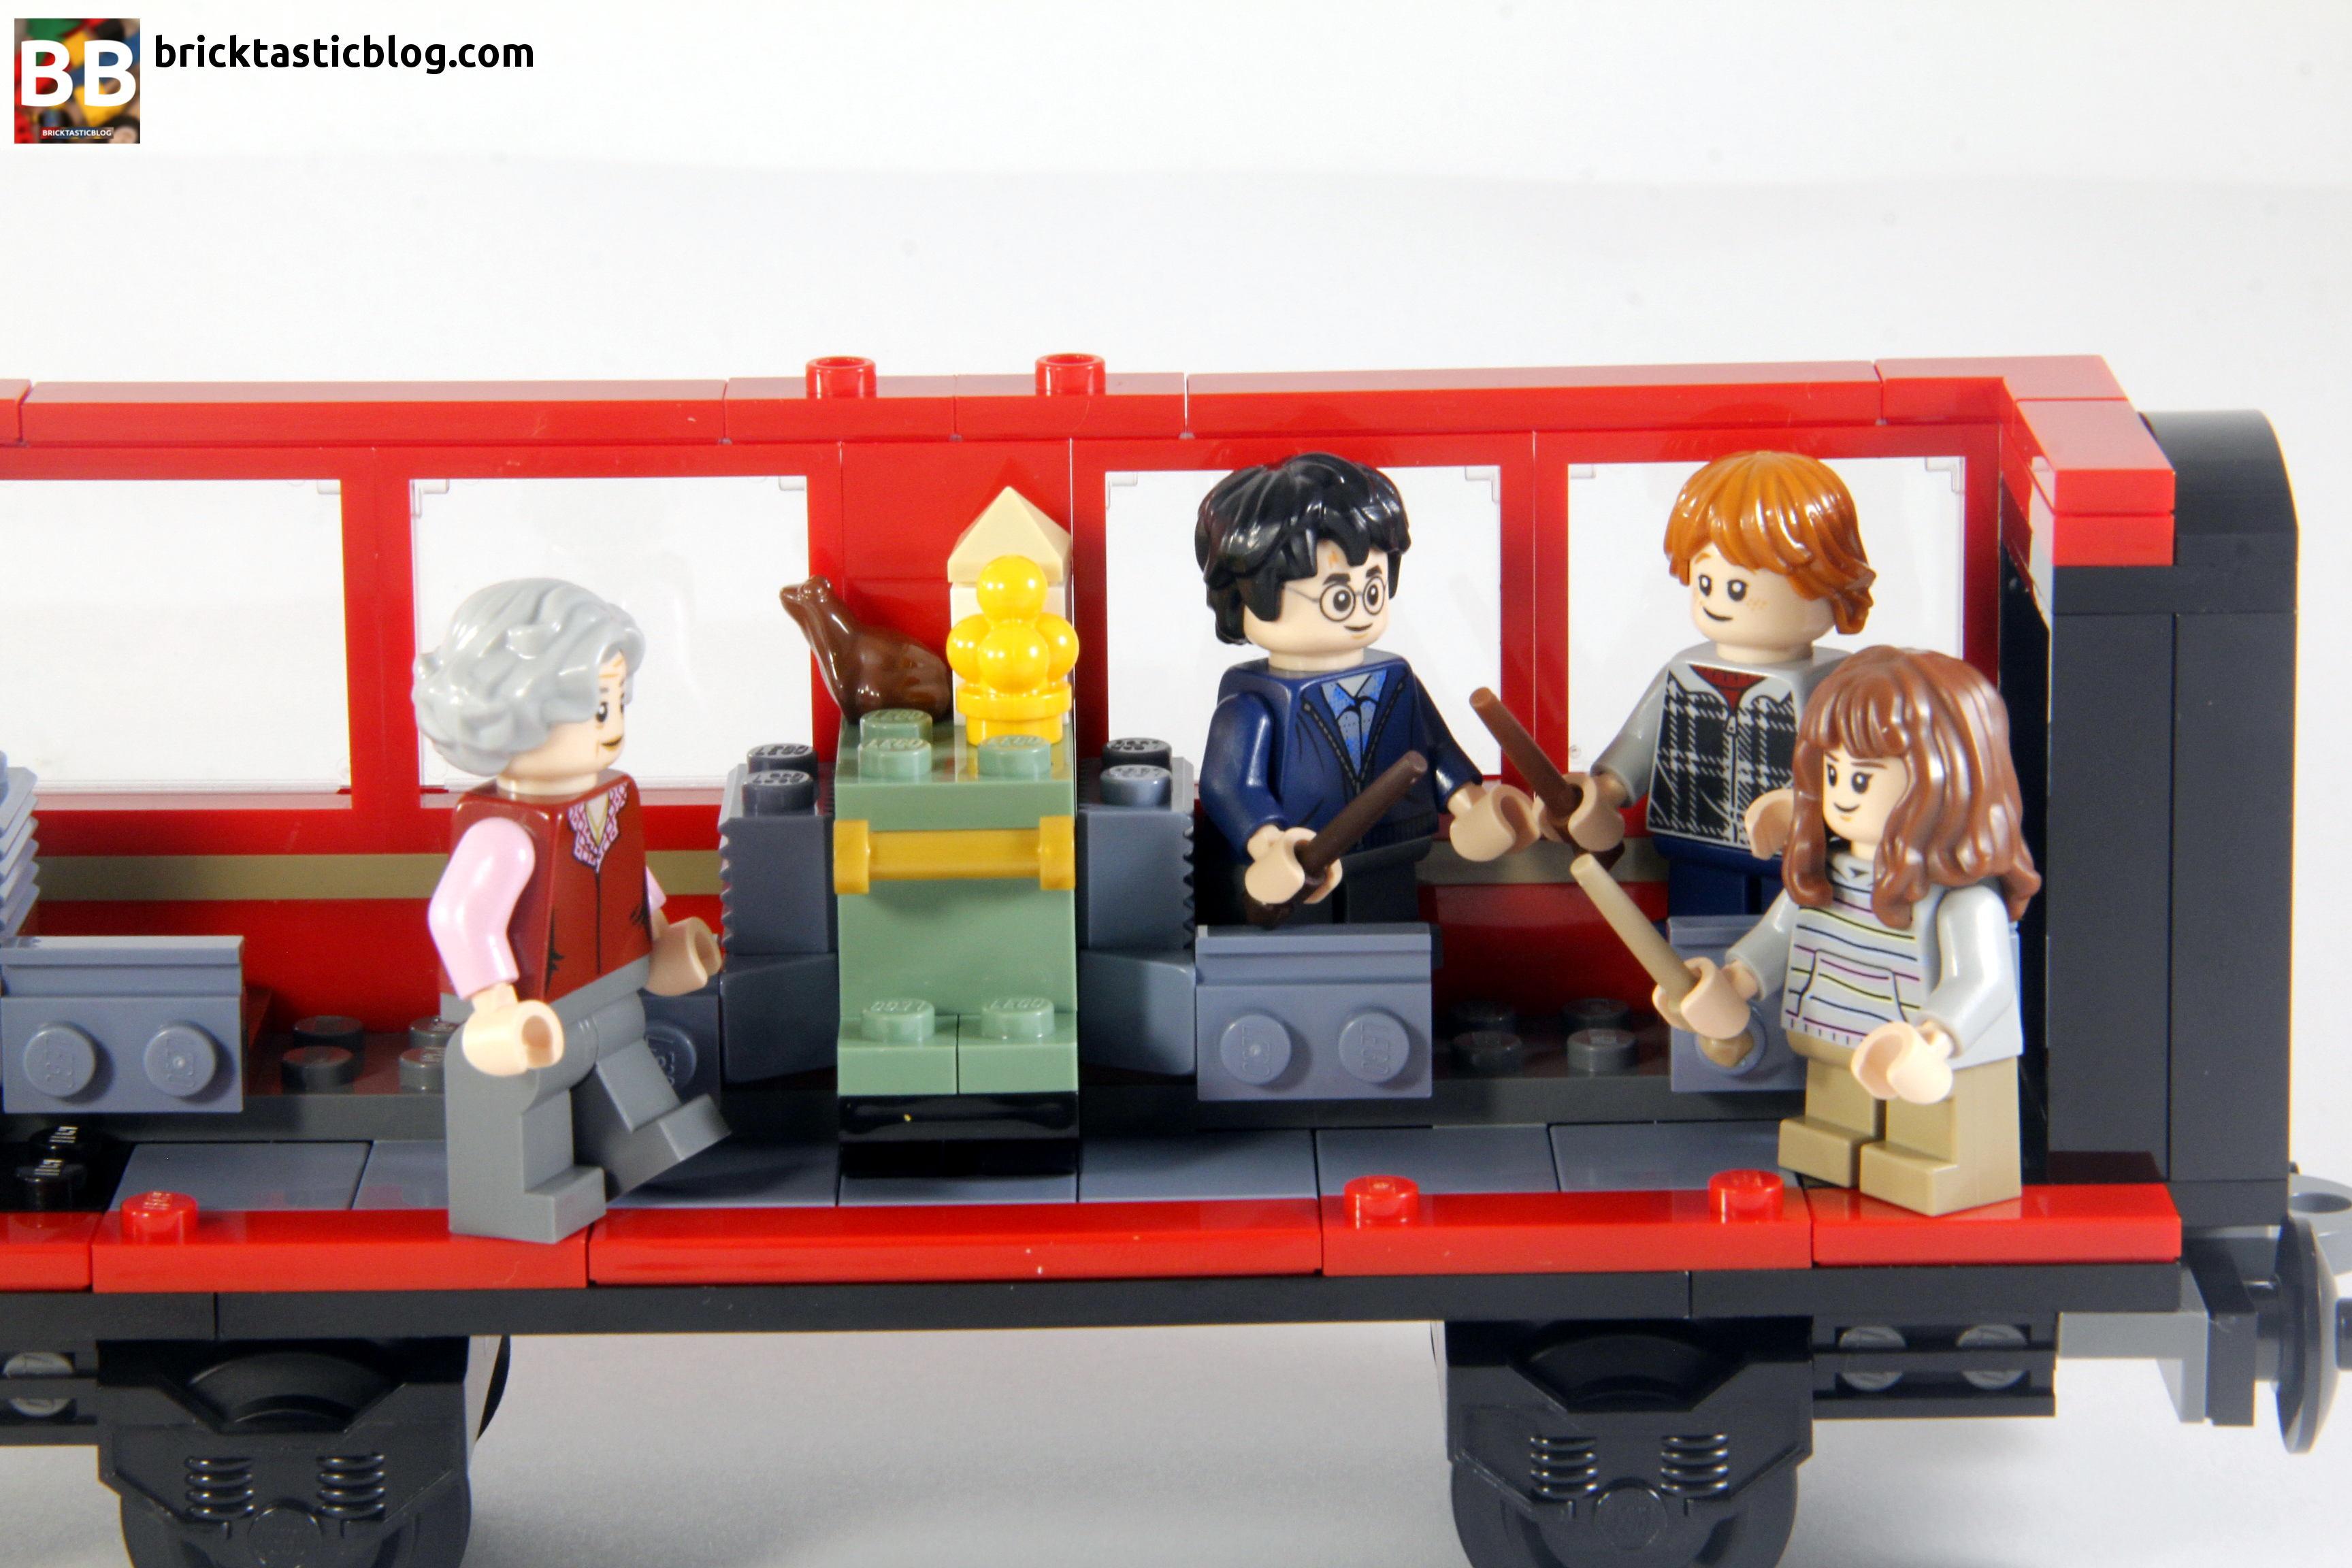 Lego Harry Potter 75955 Hogwarts Express only station platform new without figures